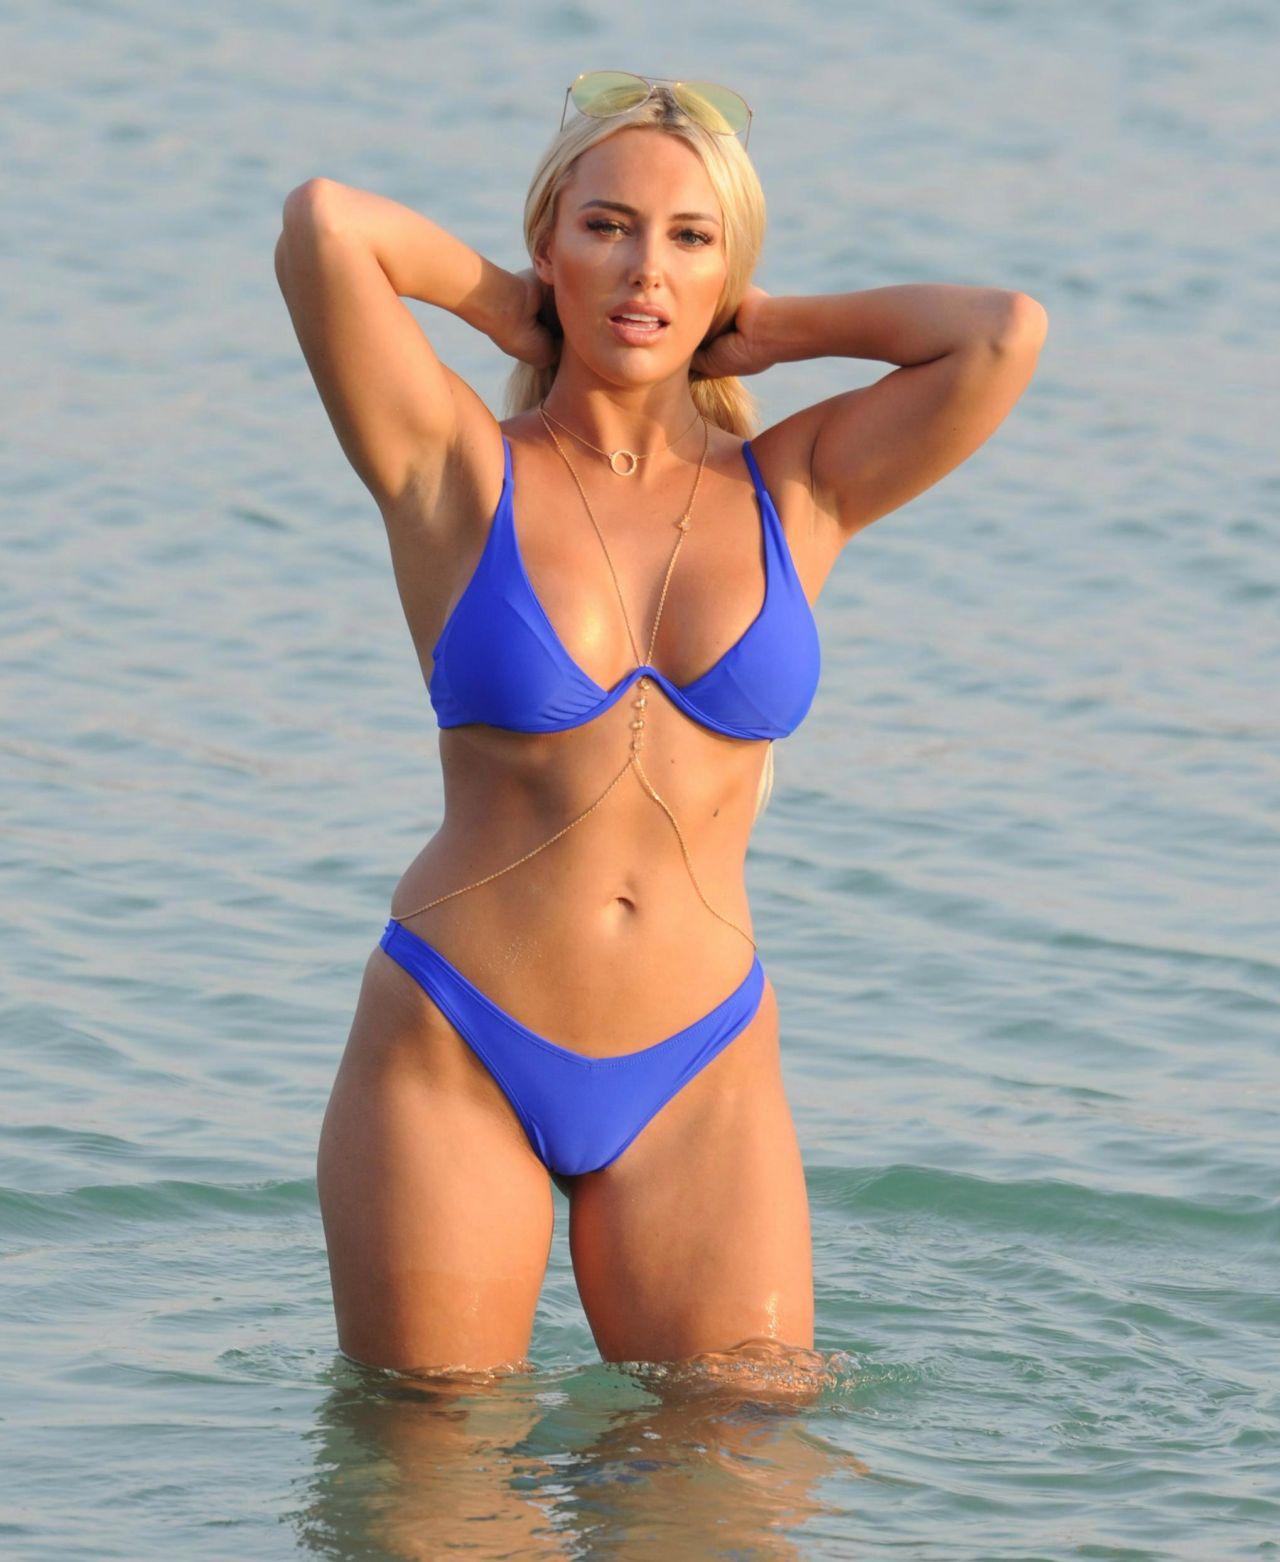 amber-turner-bikini-on-beach-in-dubai-march-2018-3